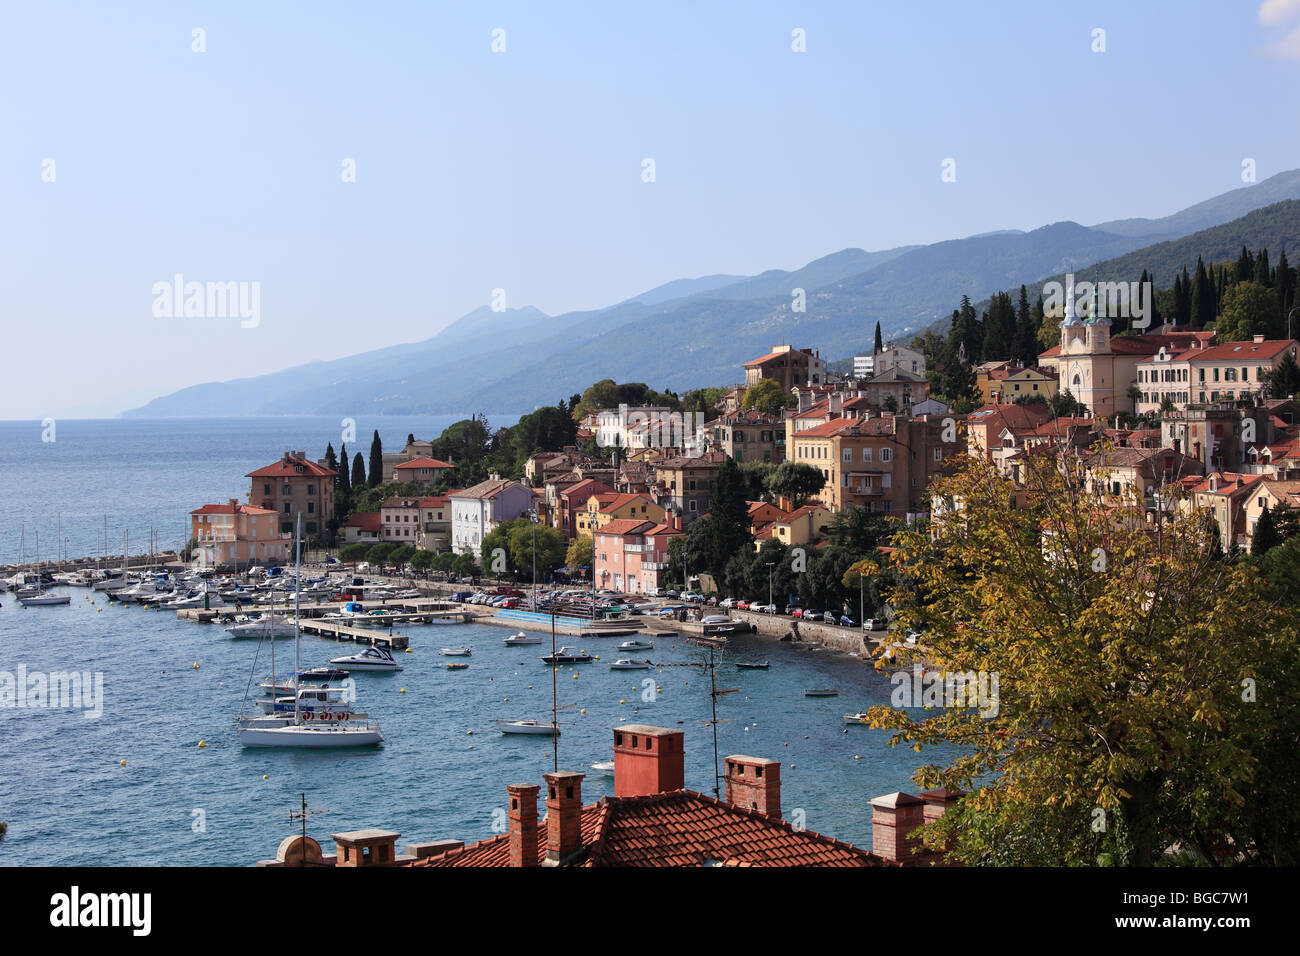 Volosko near Opatija, Istria, Kvarner Gulf, Croatia, Europe Stock Photo